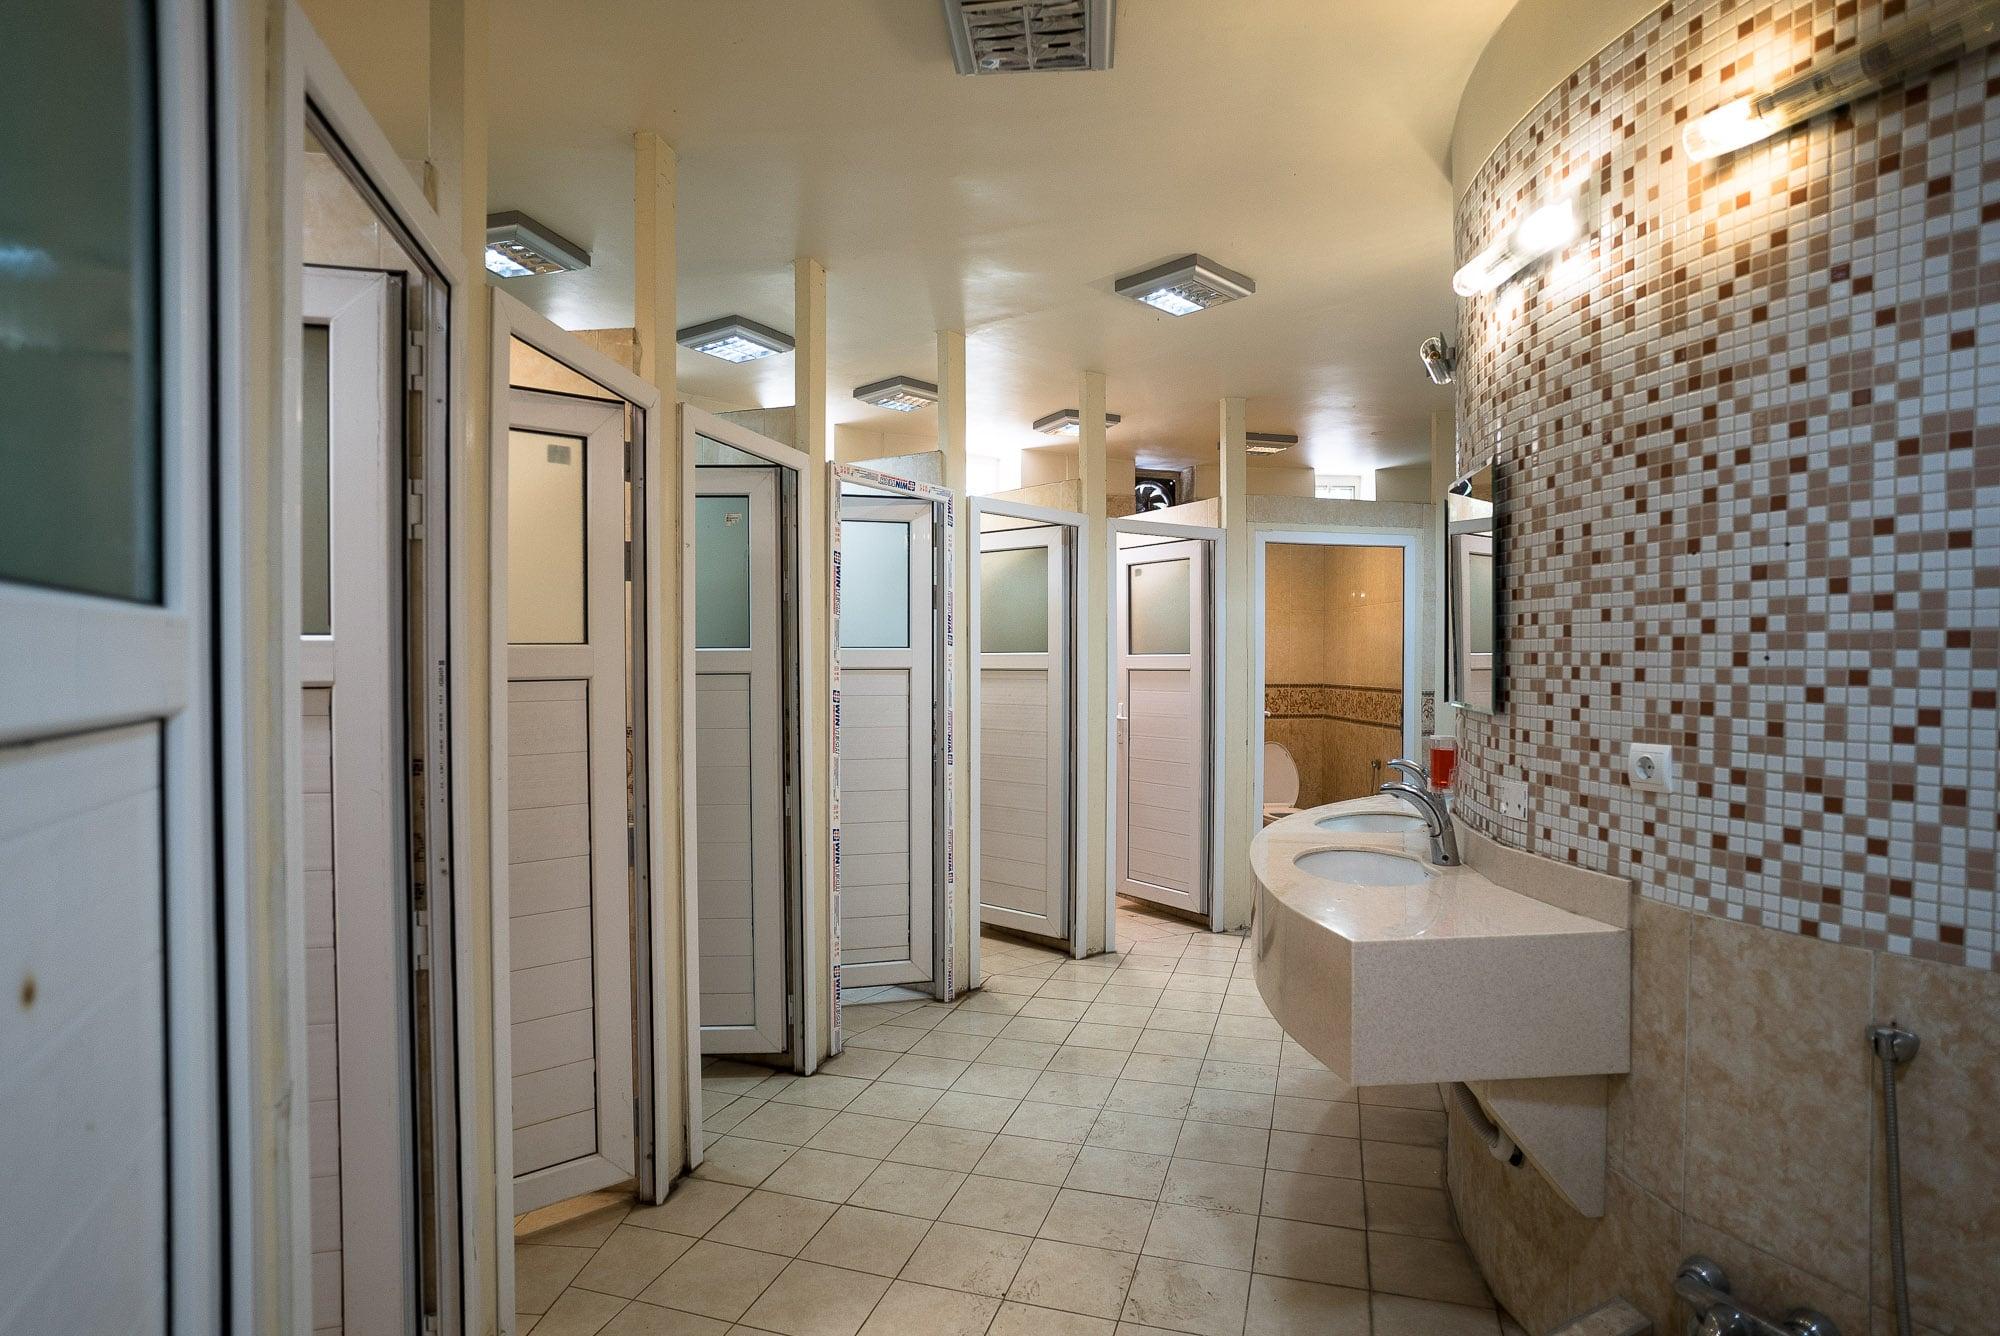 men's room in Iran